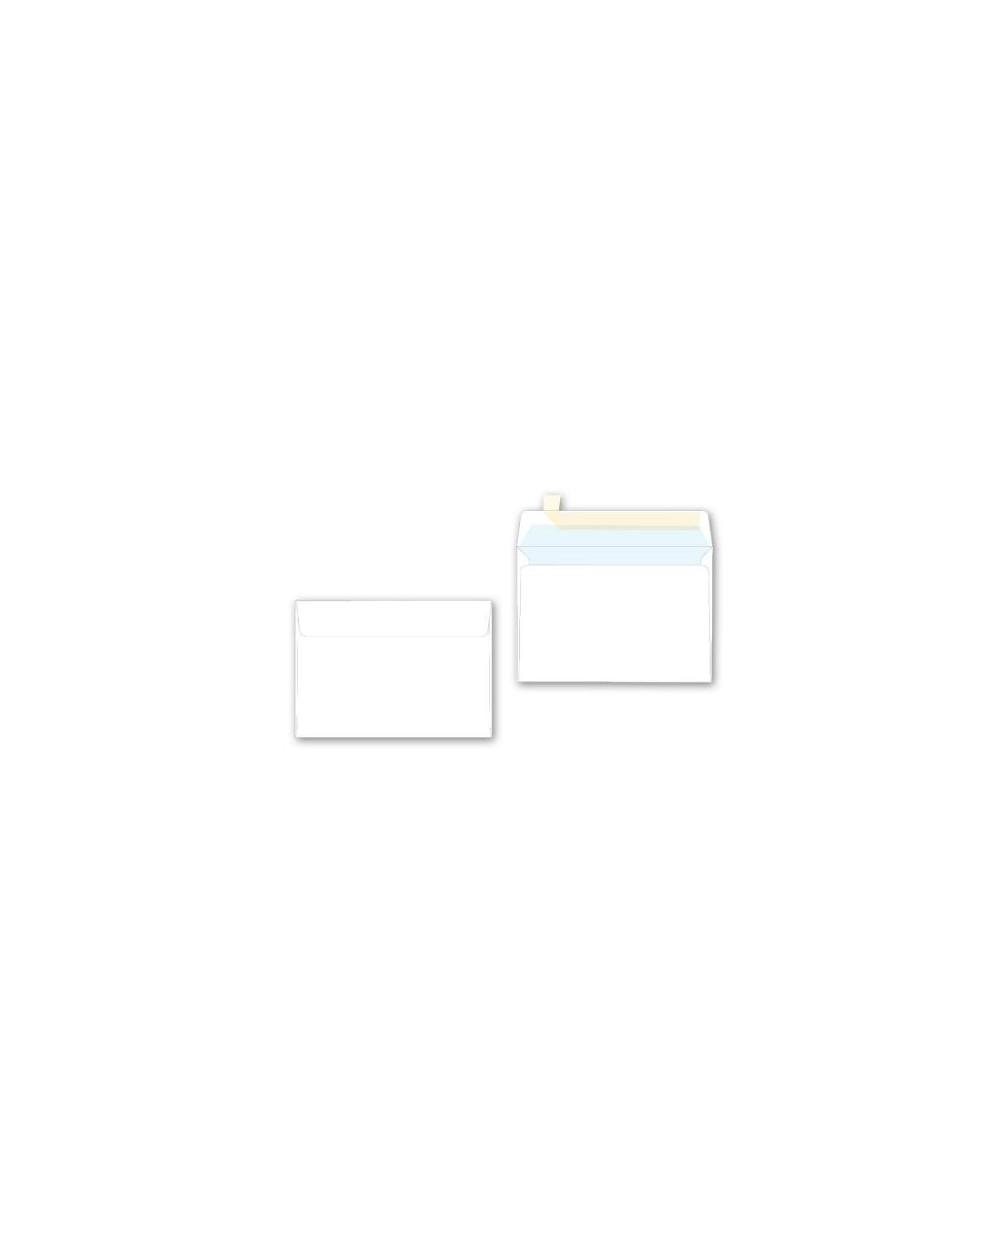 Плик SPREE C6, 114х162, бял с лента, 50бр., 80 г/м2, FSC